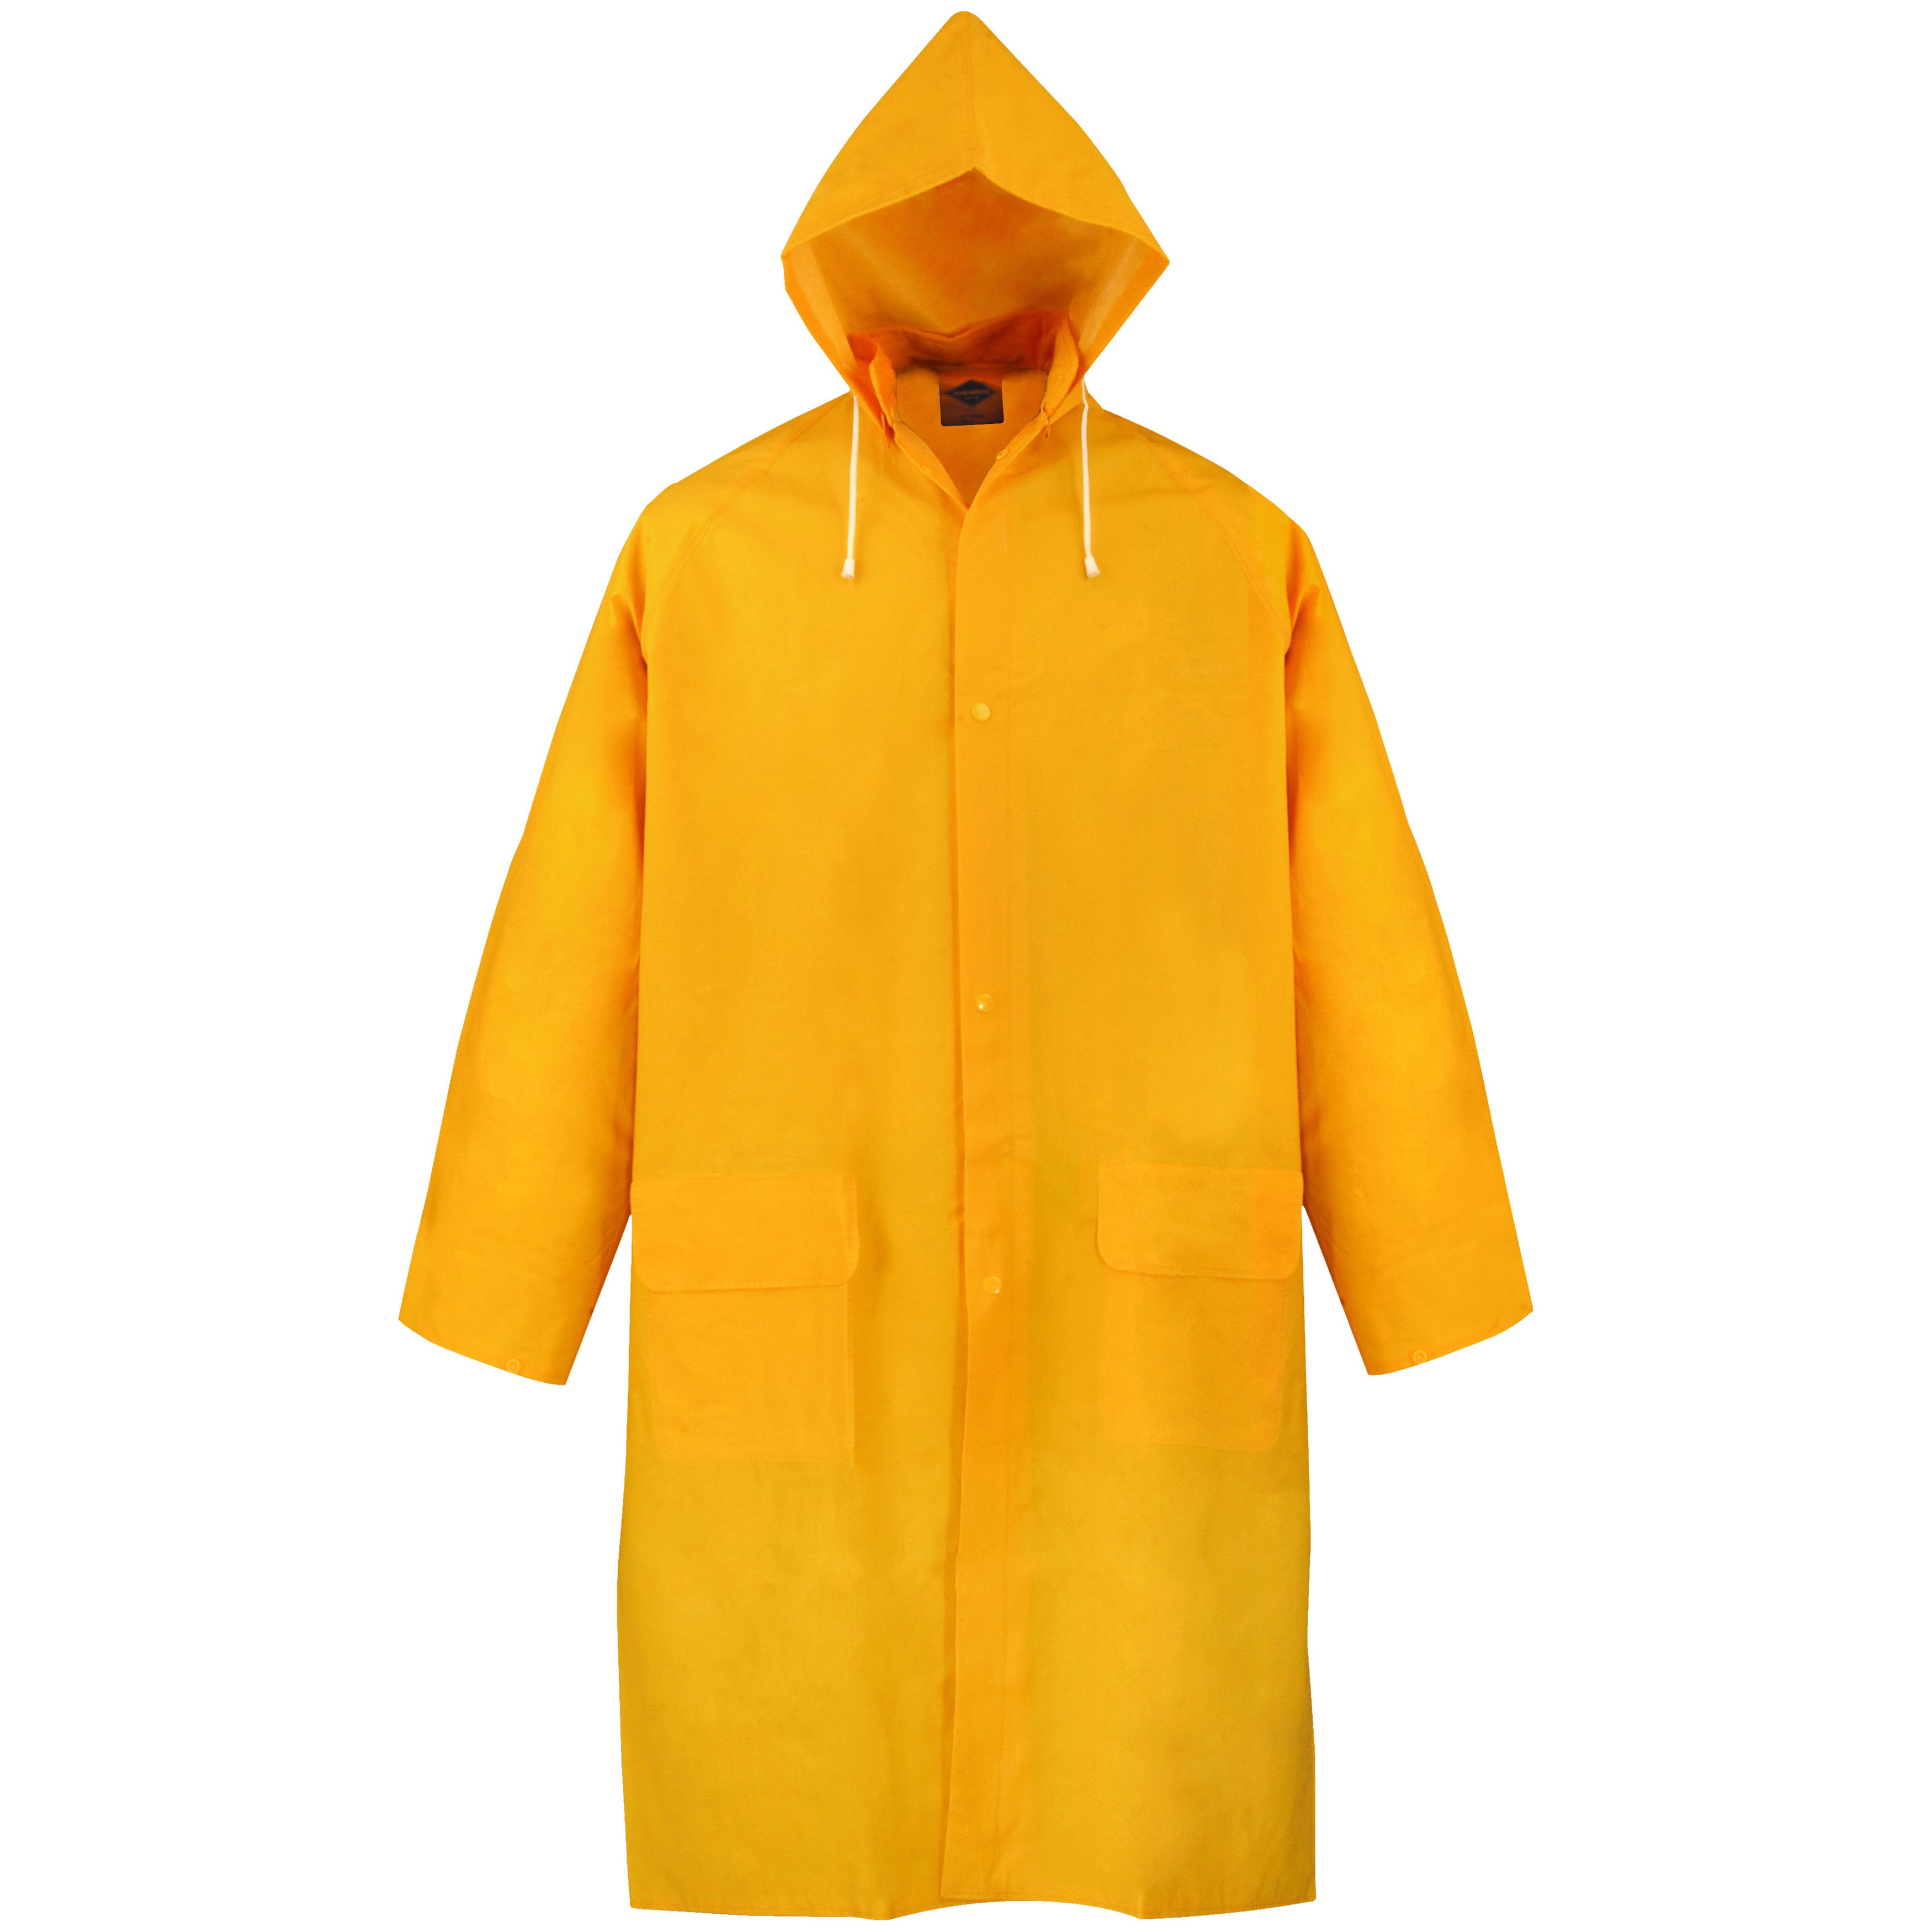 Picture of Diamondback PY-800L Raincoat, L, Polyester/PVC, Yellow, Removable Collar